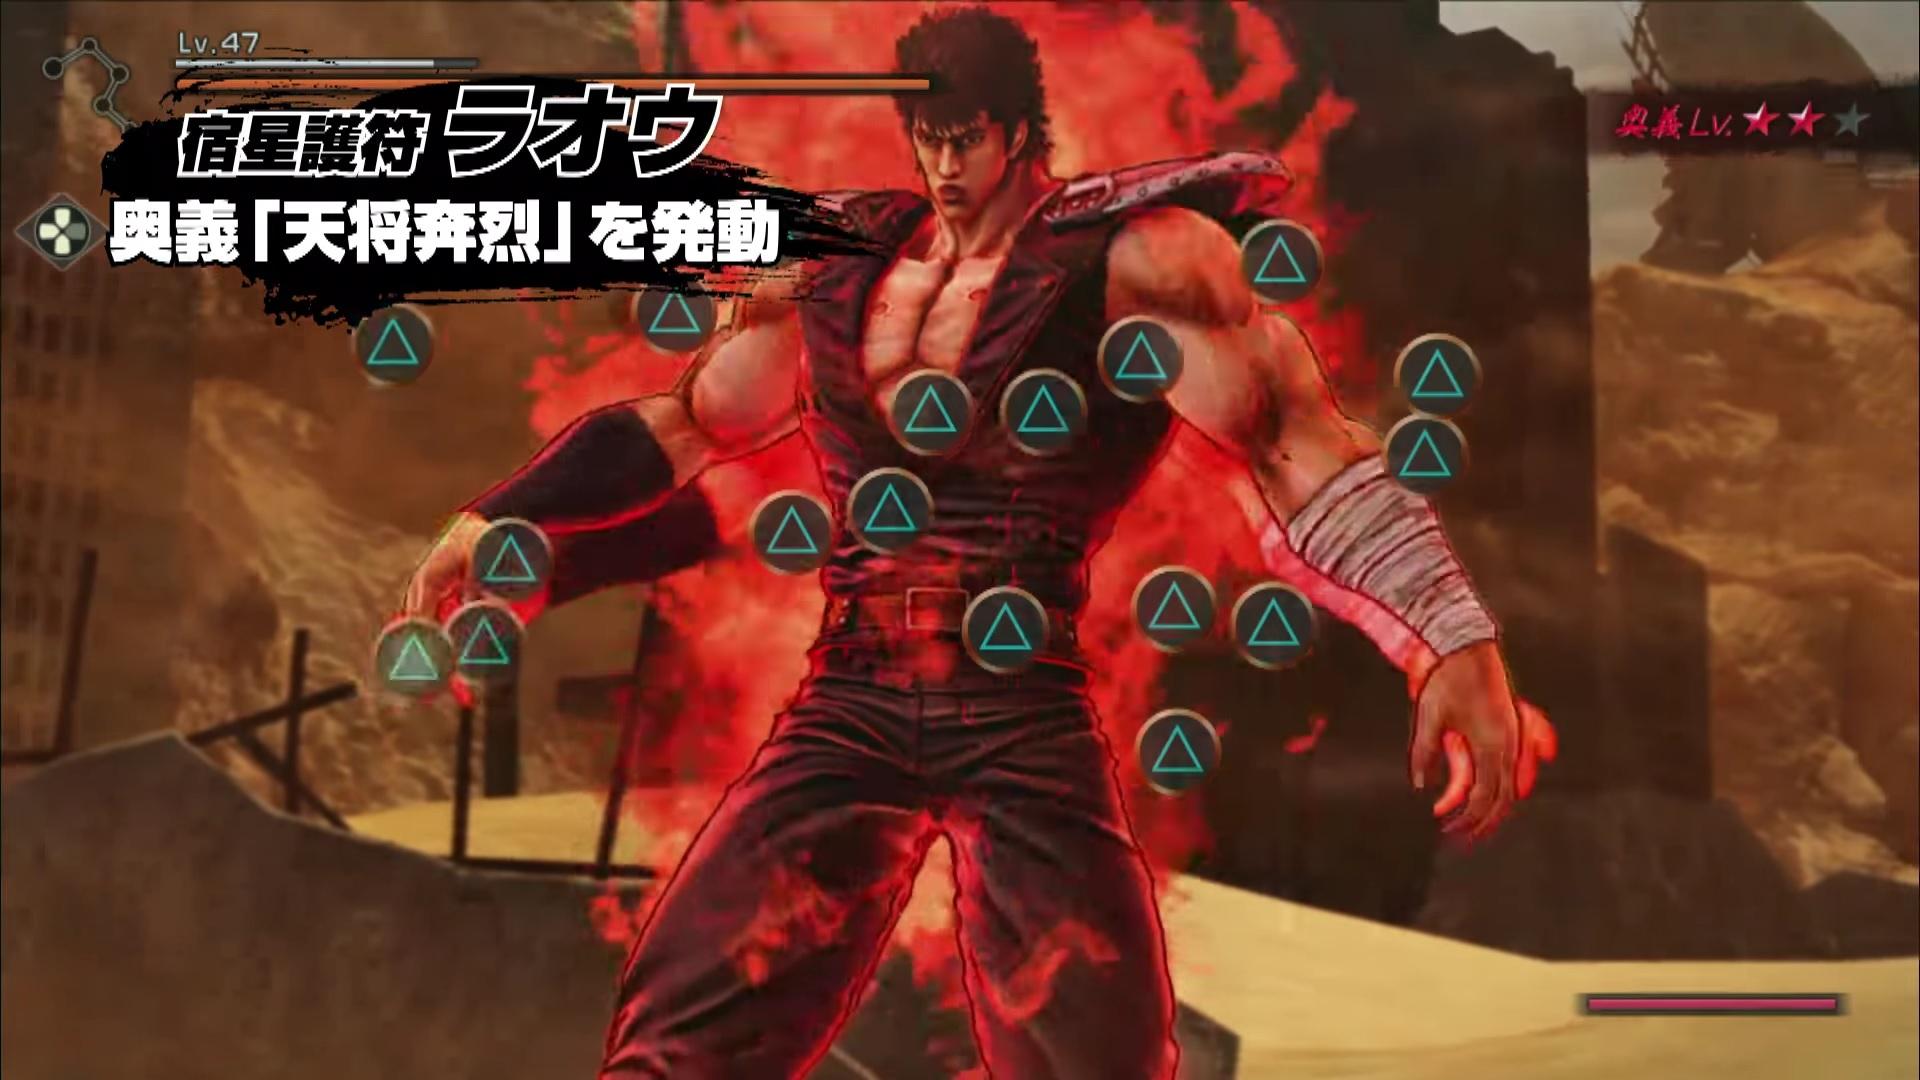 Kenshiro Has Many Ways Of Dealing With Foes In Hokuto Ga Gotoku